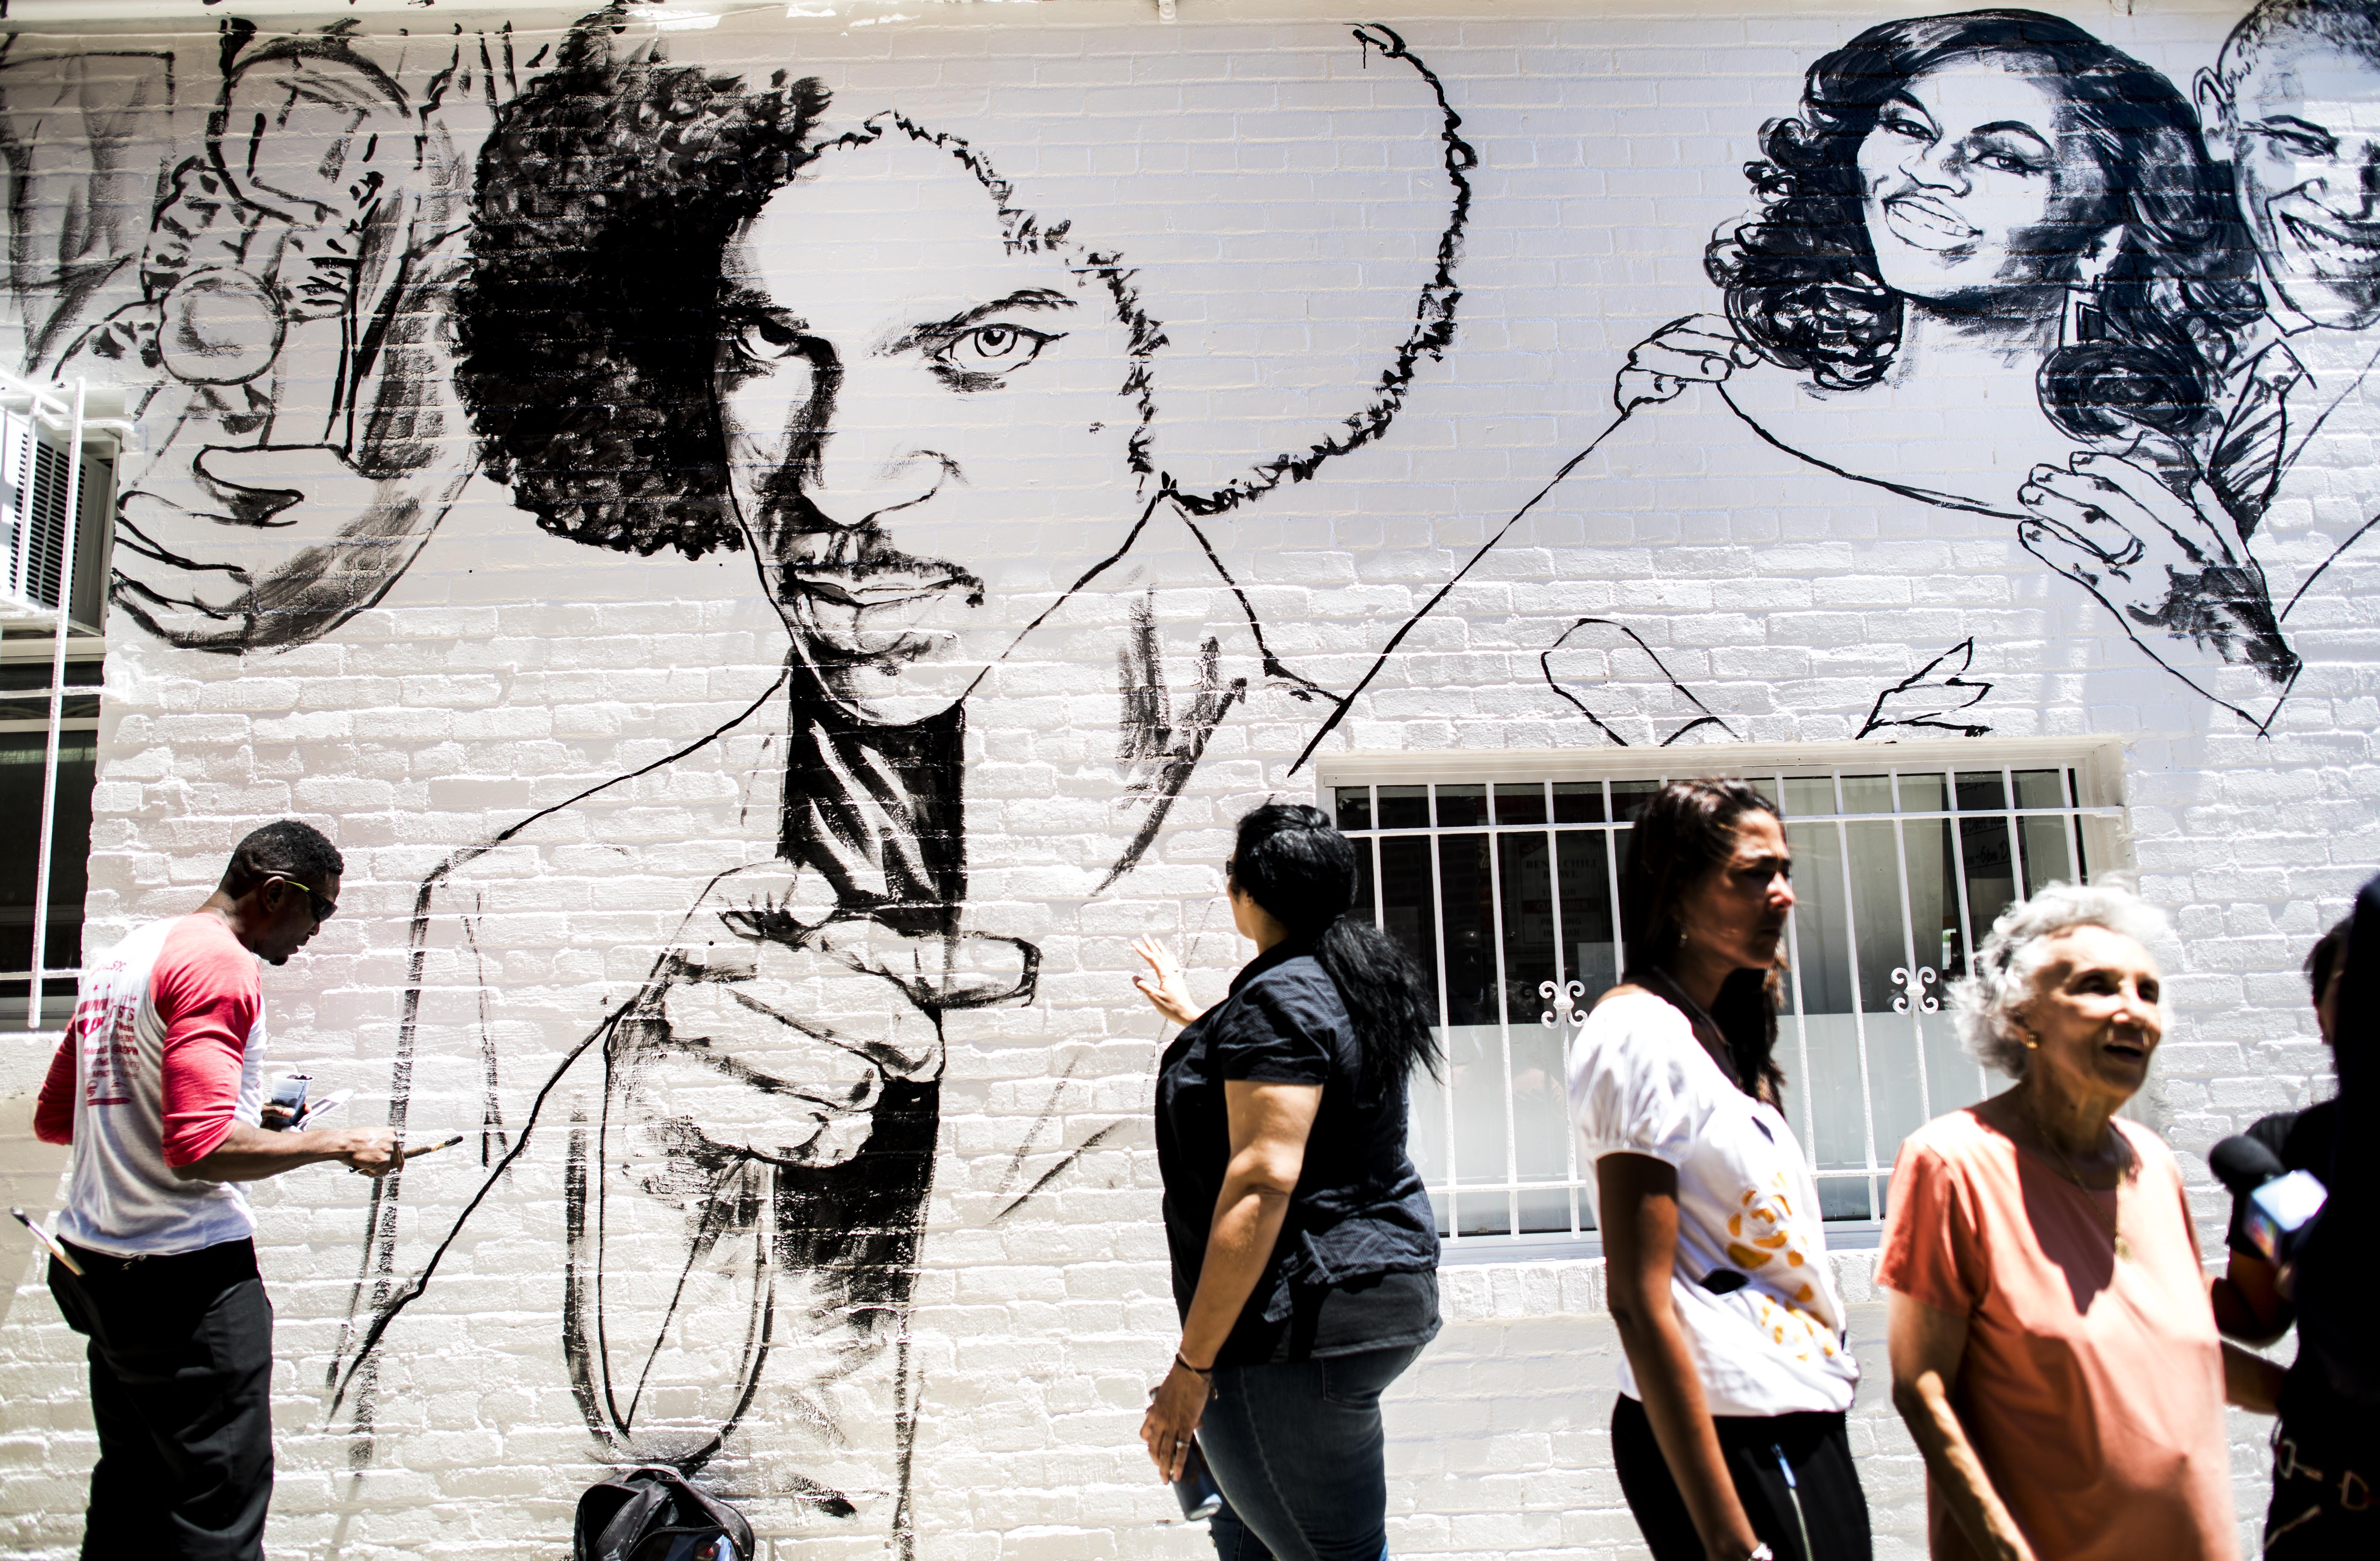 Ben's Chili Bowl mural